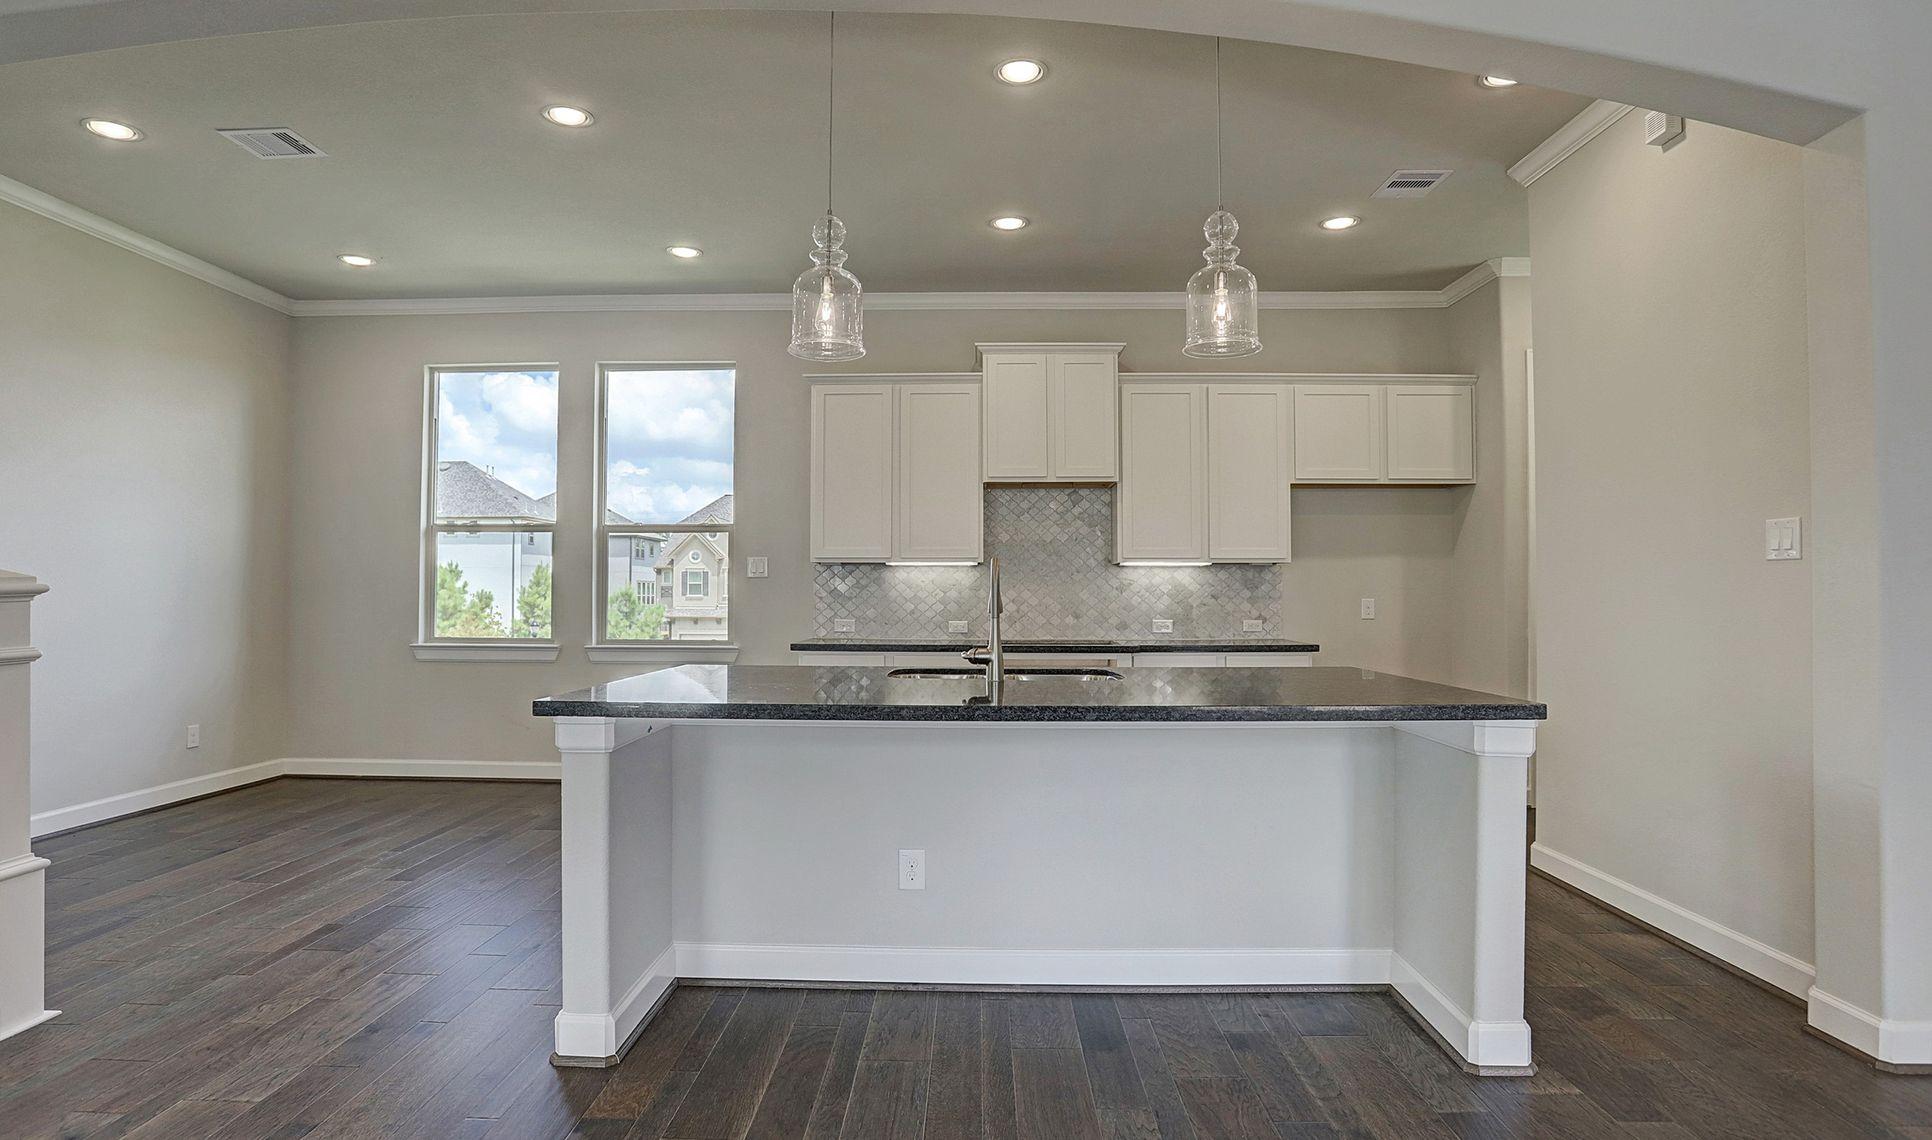 Interior:Elegant lighting in kitchen